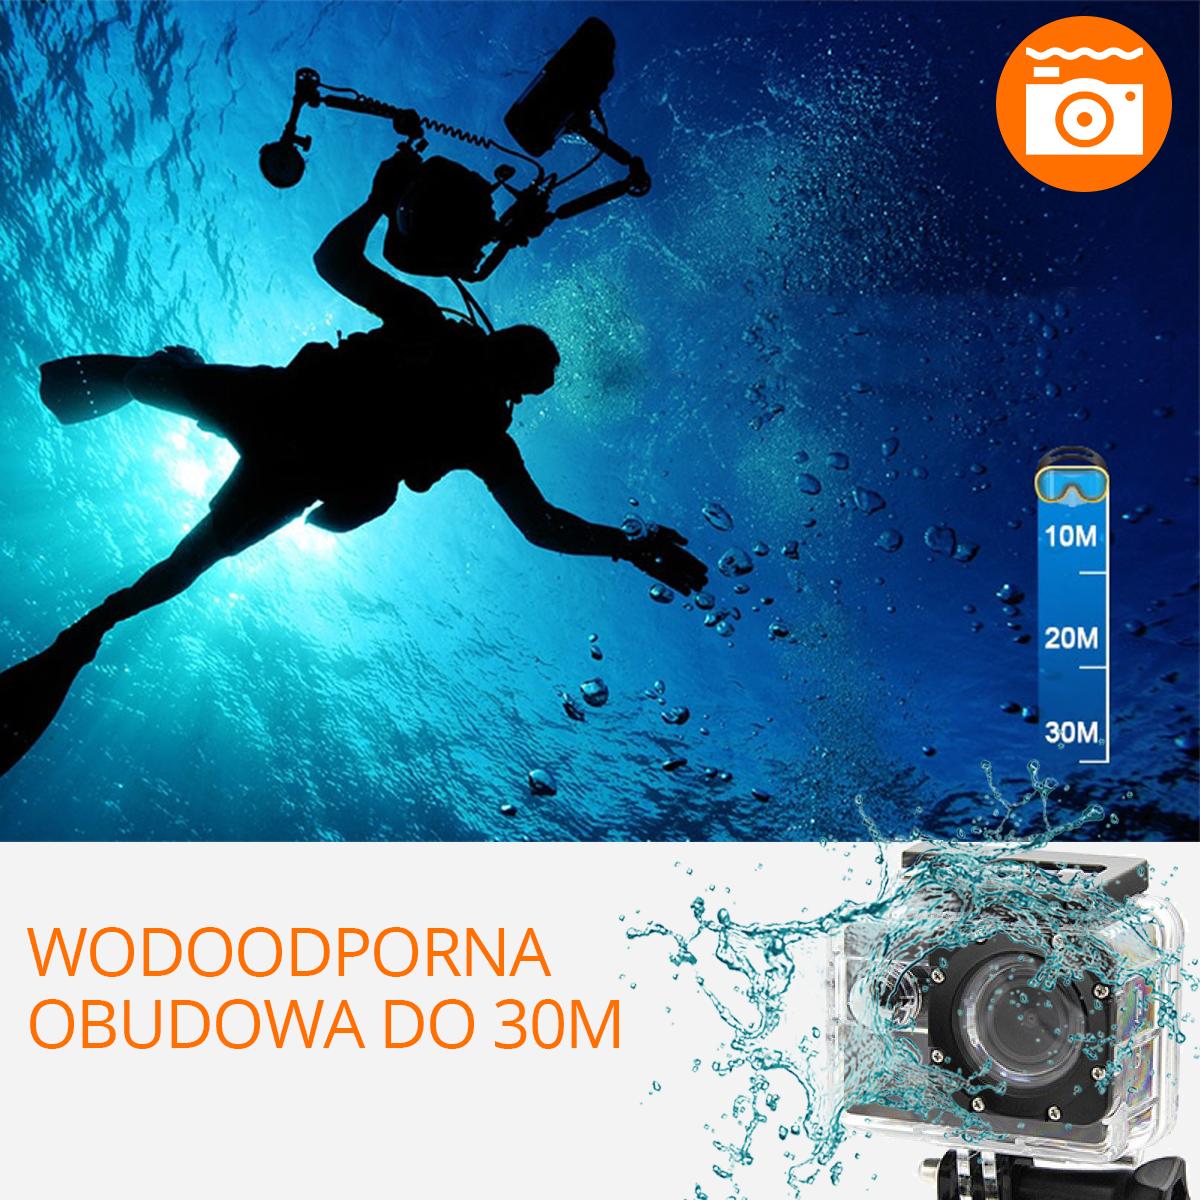 kamerka-sportowa-4k-XPRO-GO-wodoodporna-orllo-pl